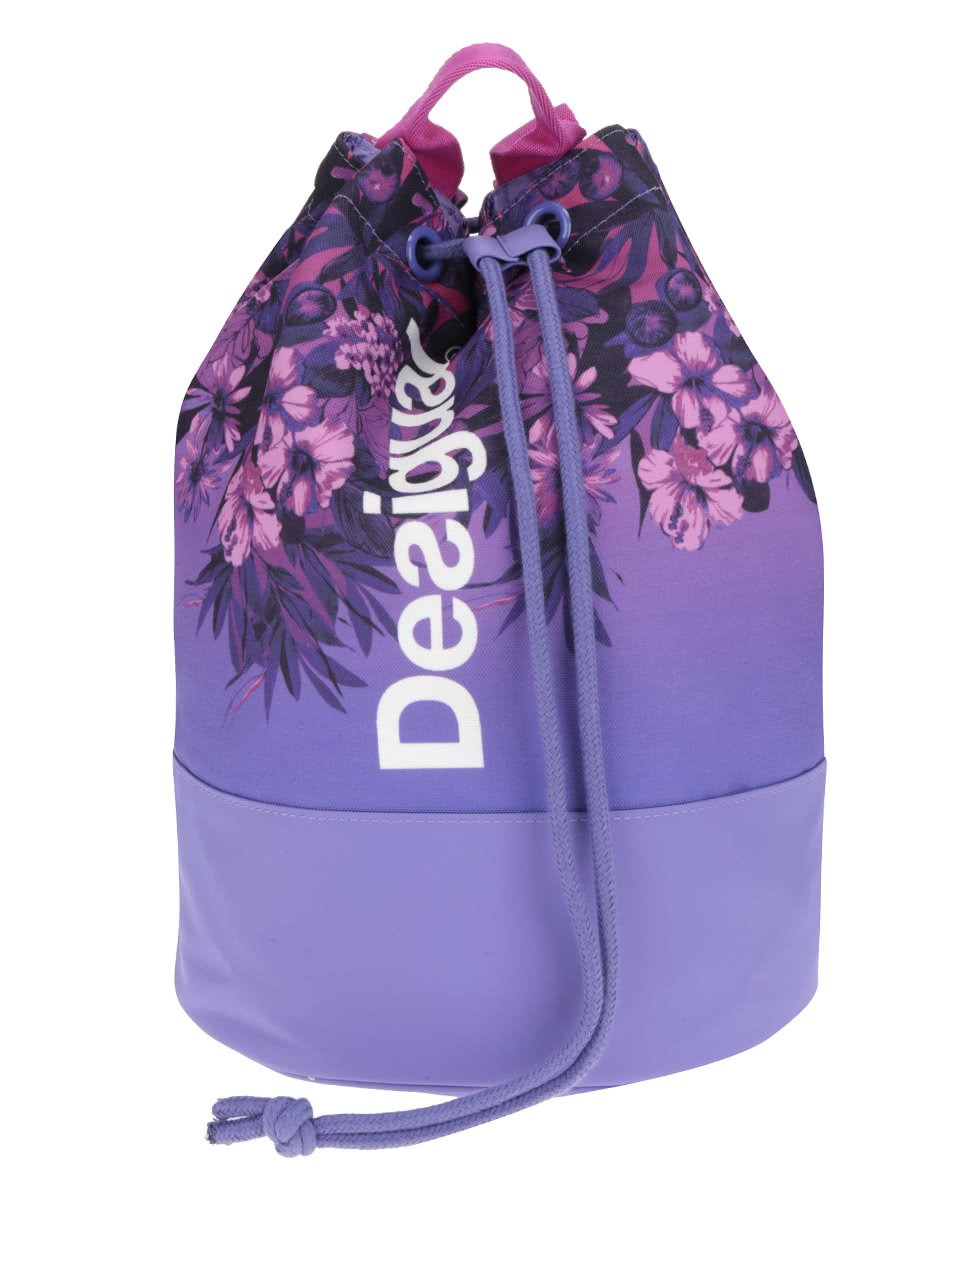 Růžovo-fialový květovaný vak Desigual Sport Bols